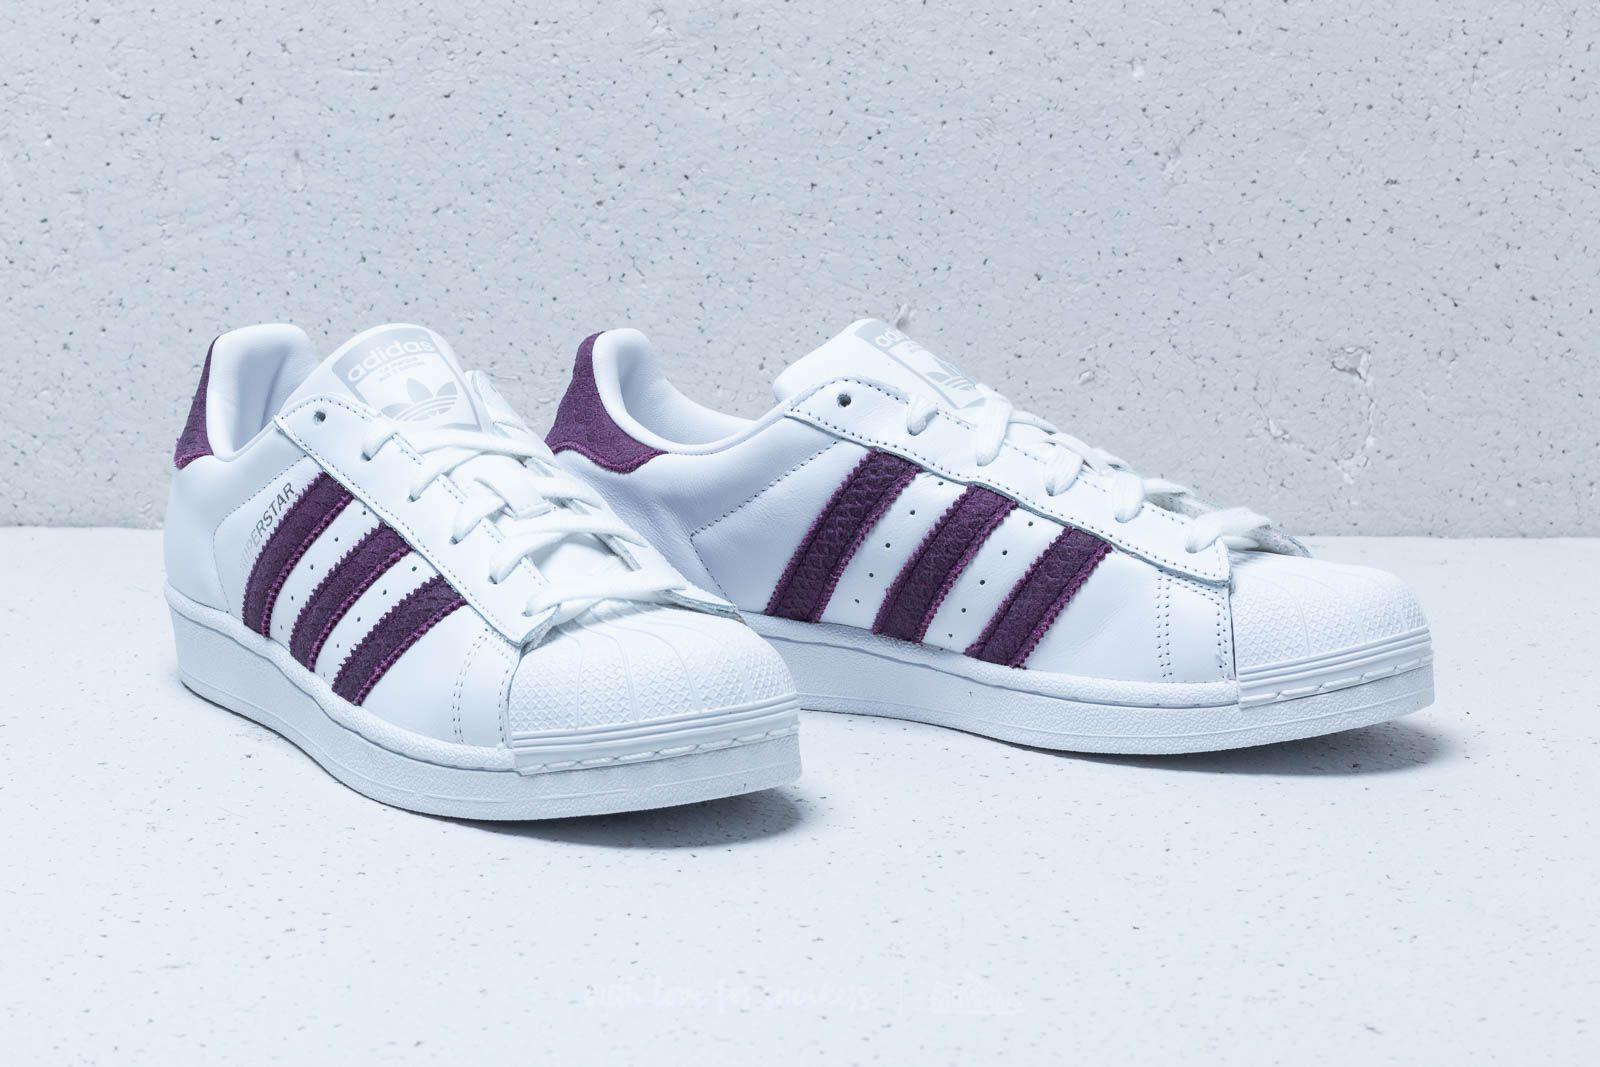 ed364e0c90d3 Lyst - adidas Originals Adidas Superstar W Ftw White  Red Night ...